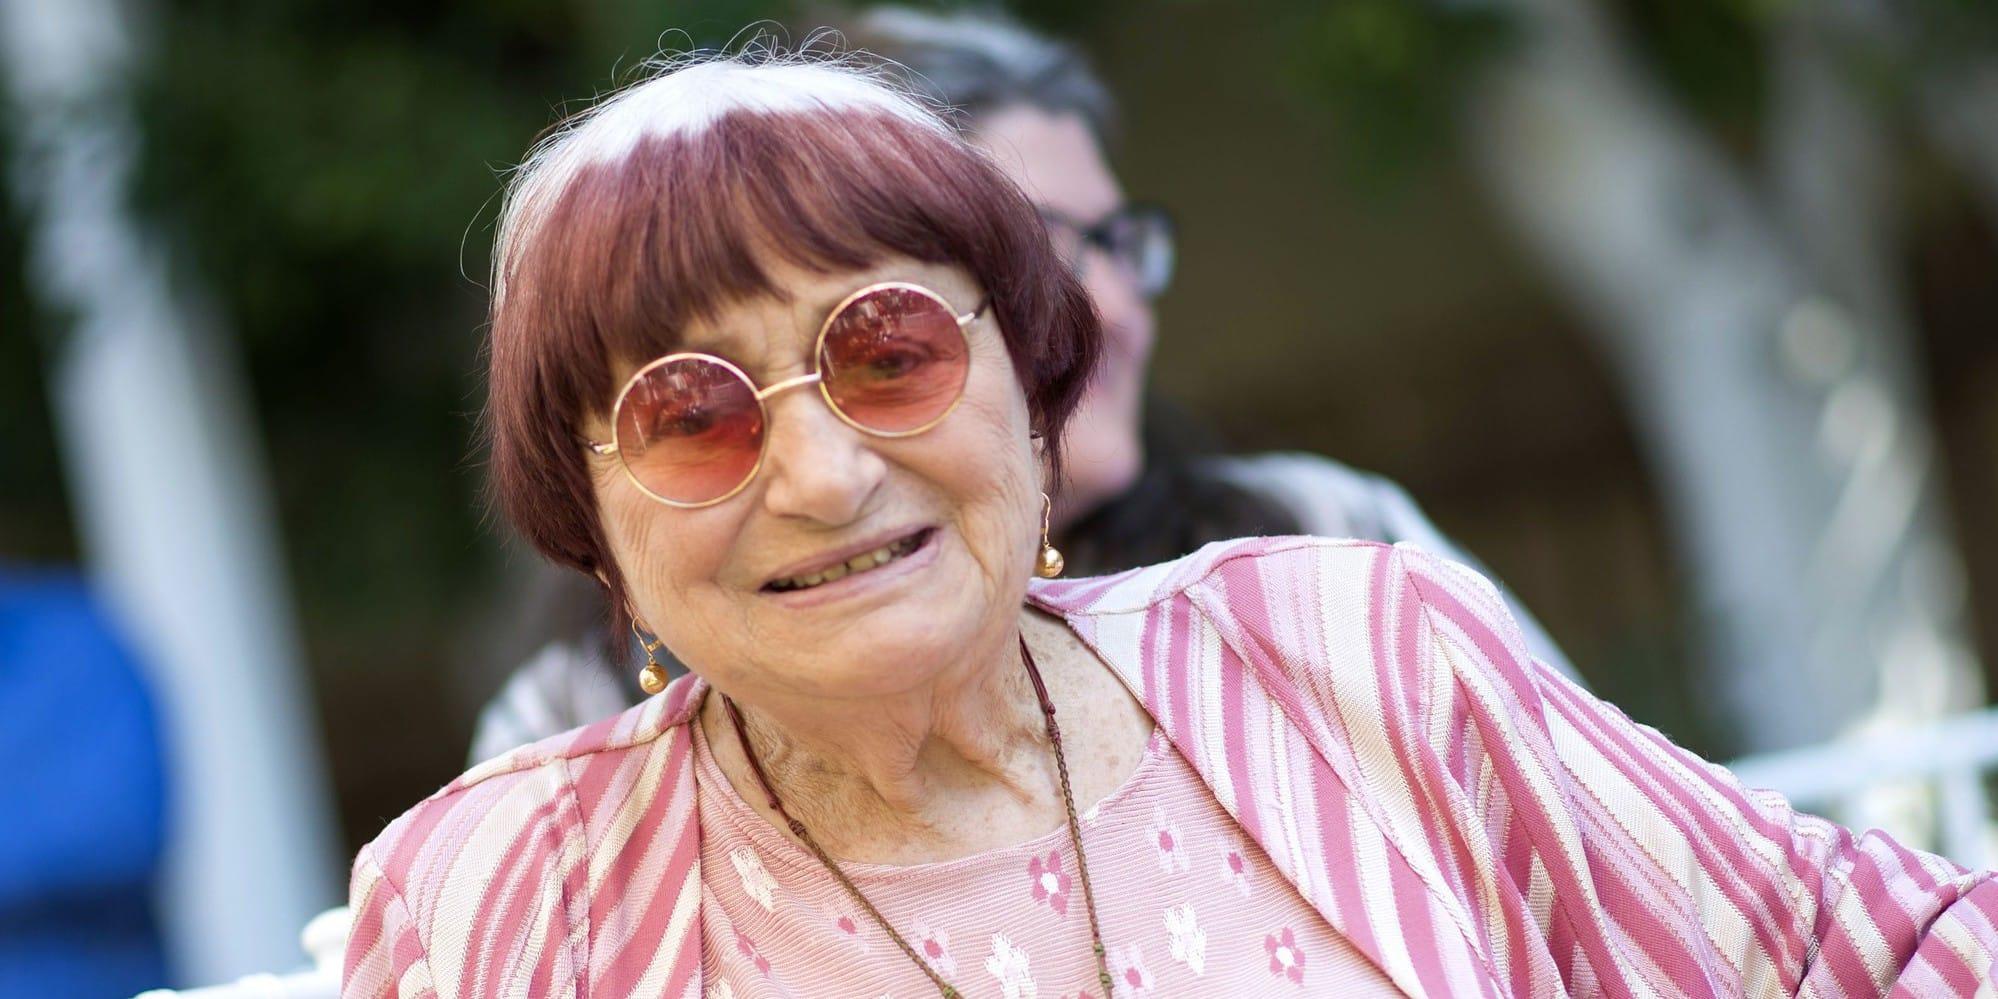 Agnes Varda vie Paris